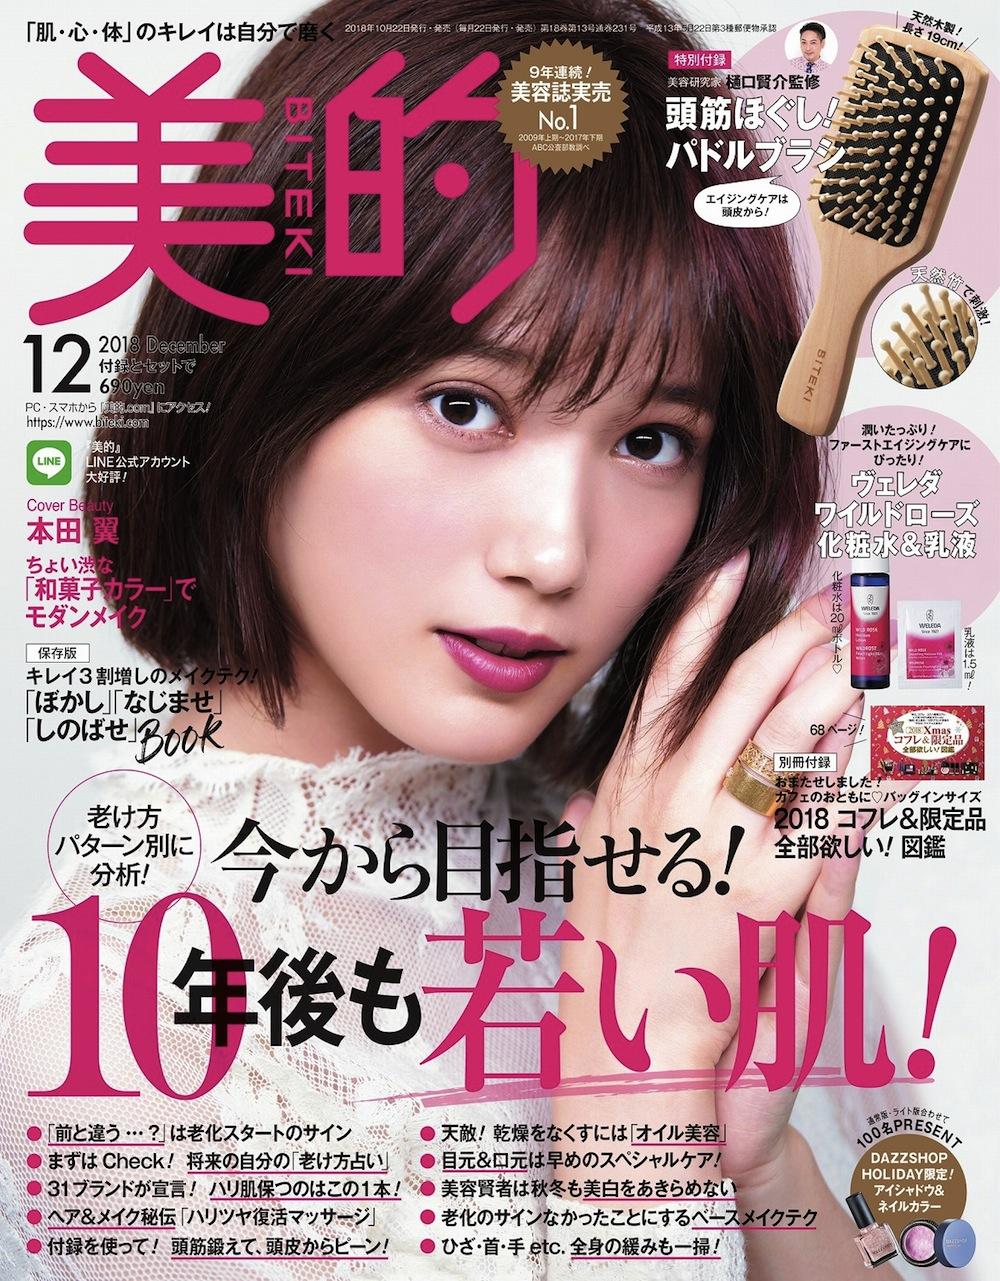 本田翼、美容誌『美的』の表紙